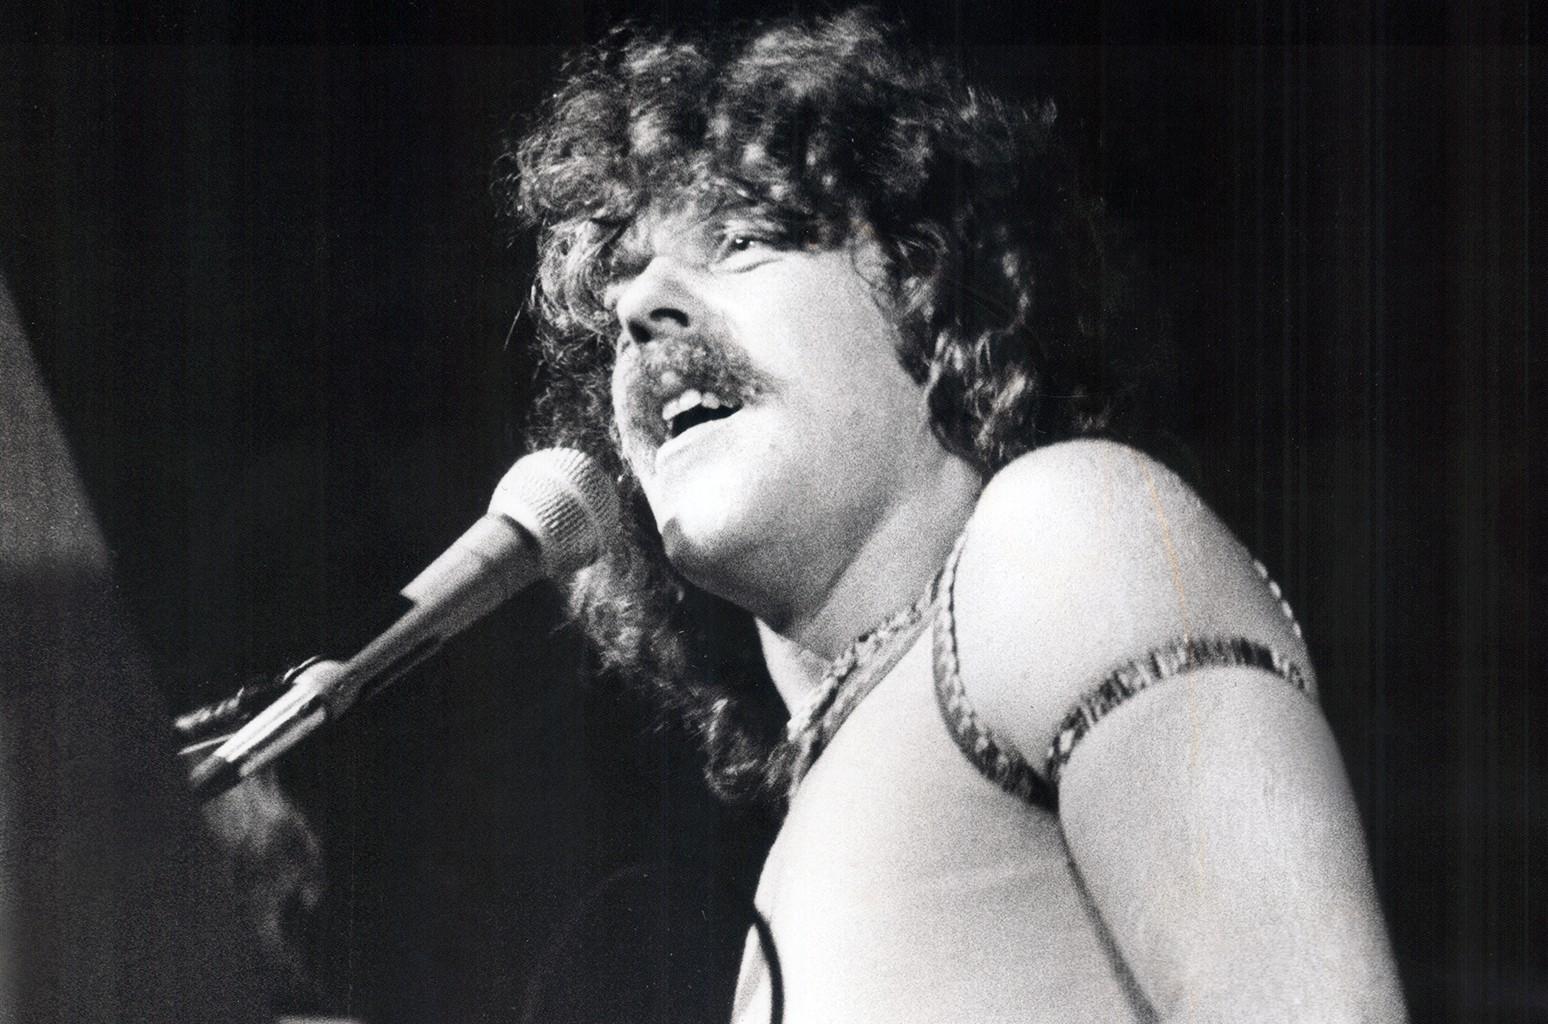 Skip Prokop, 1974